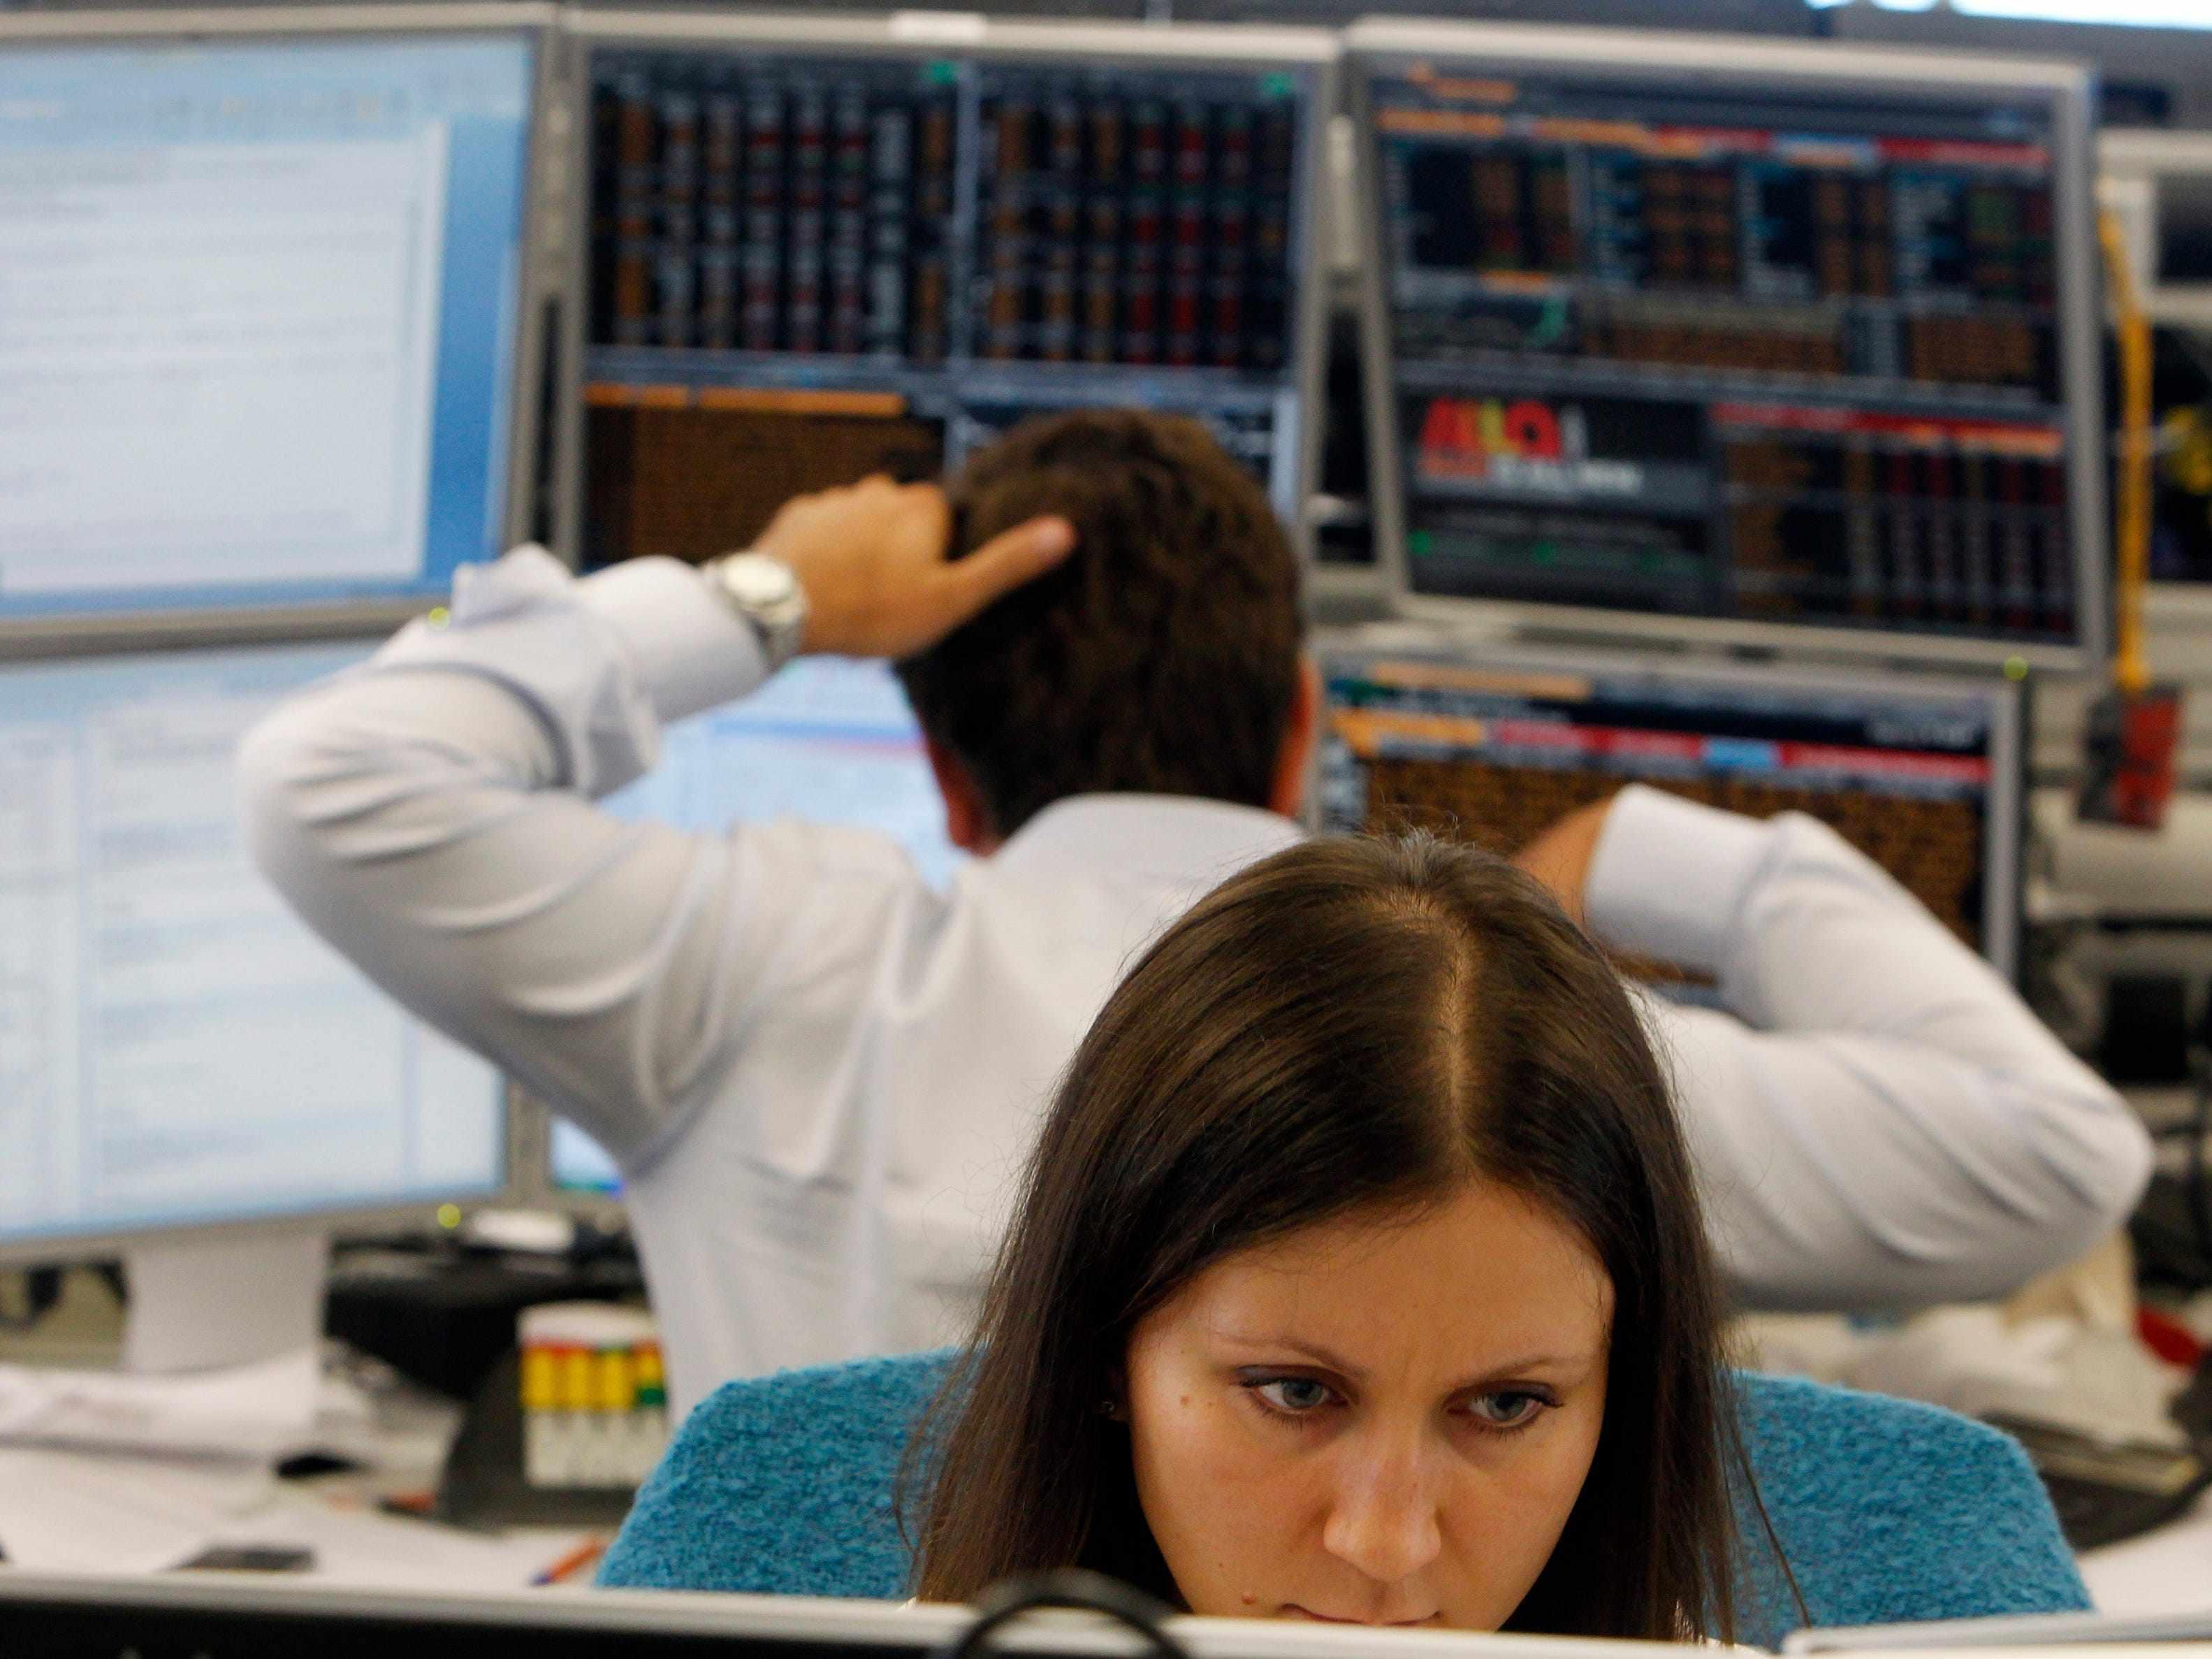 A Fintech Expert Has Advice on Valuing IPOs